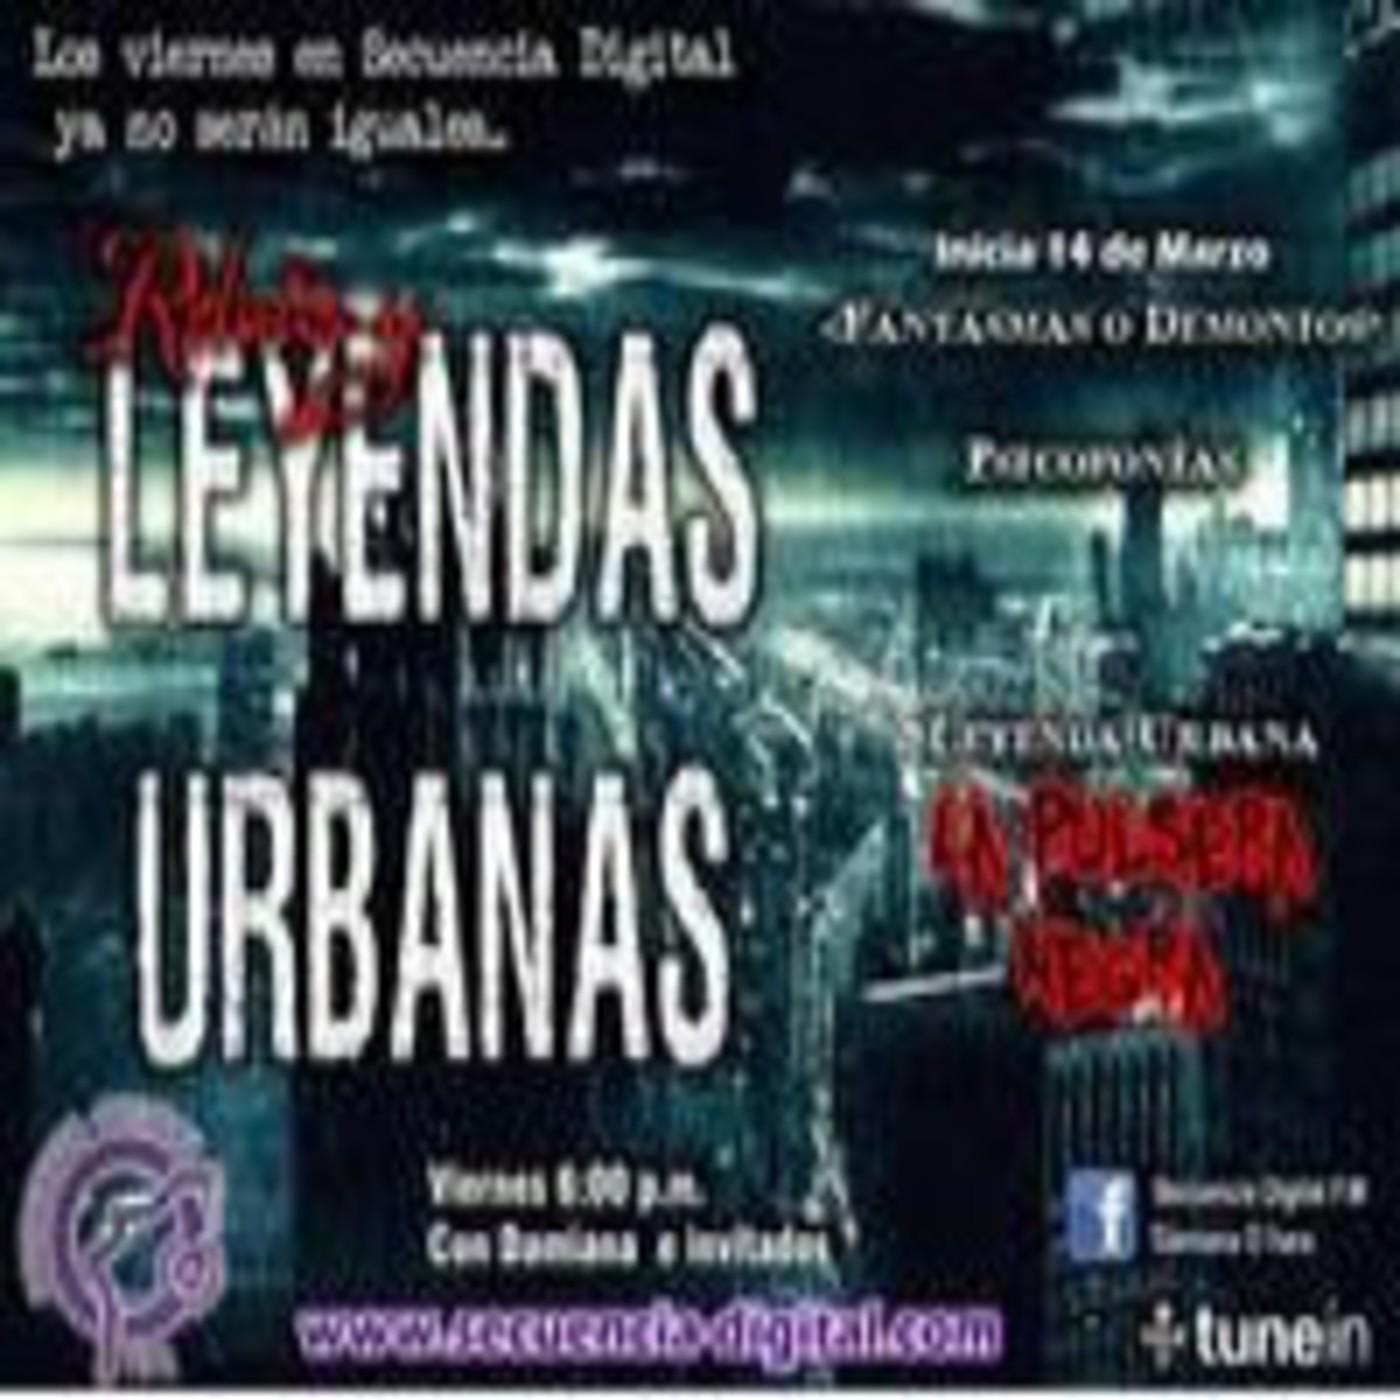 Relatos Y Leyendas Urbanas Primer Programa (Damiana,Dorian, Ruben) La Pulsera Negra.